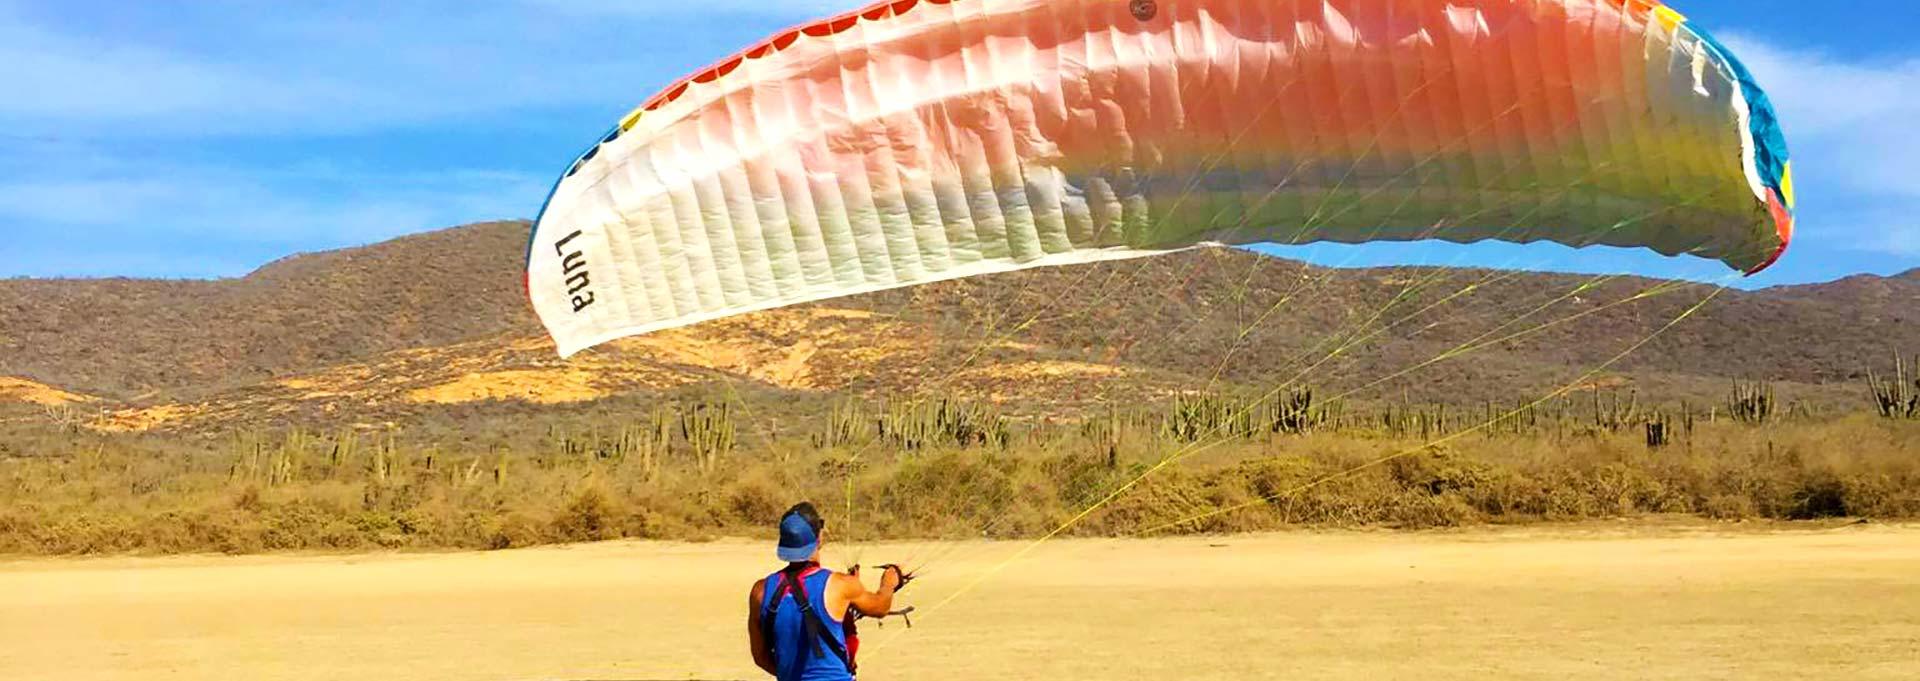 Paragliding Experiences in Baja Mexico | Paramotor Training